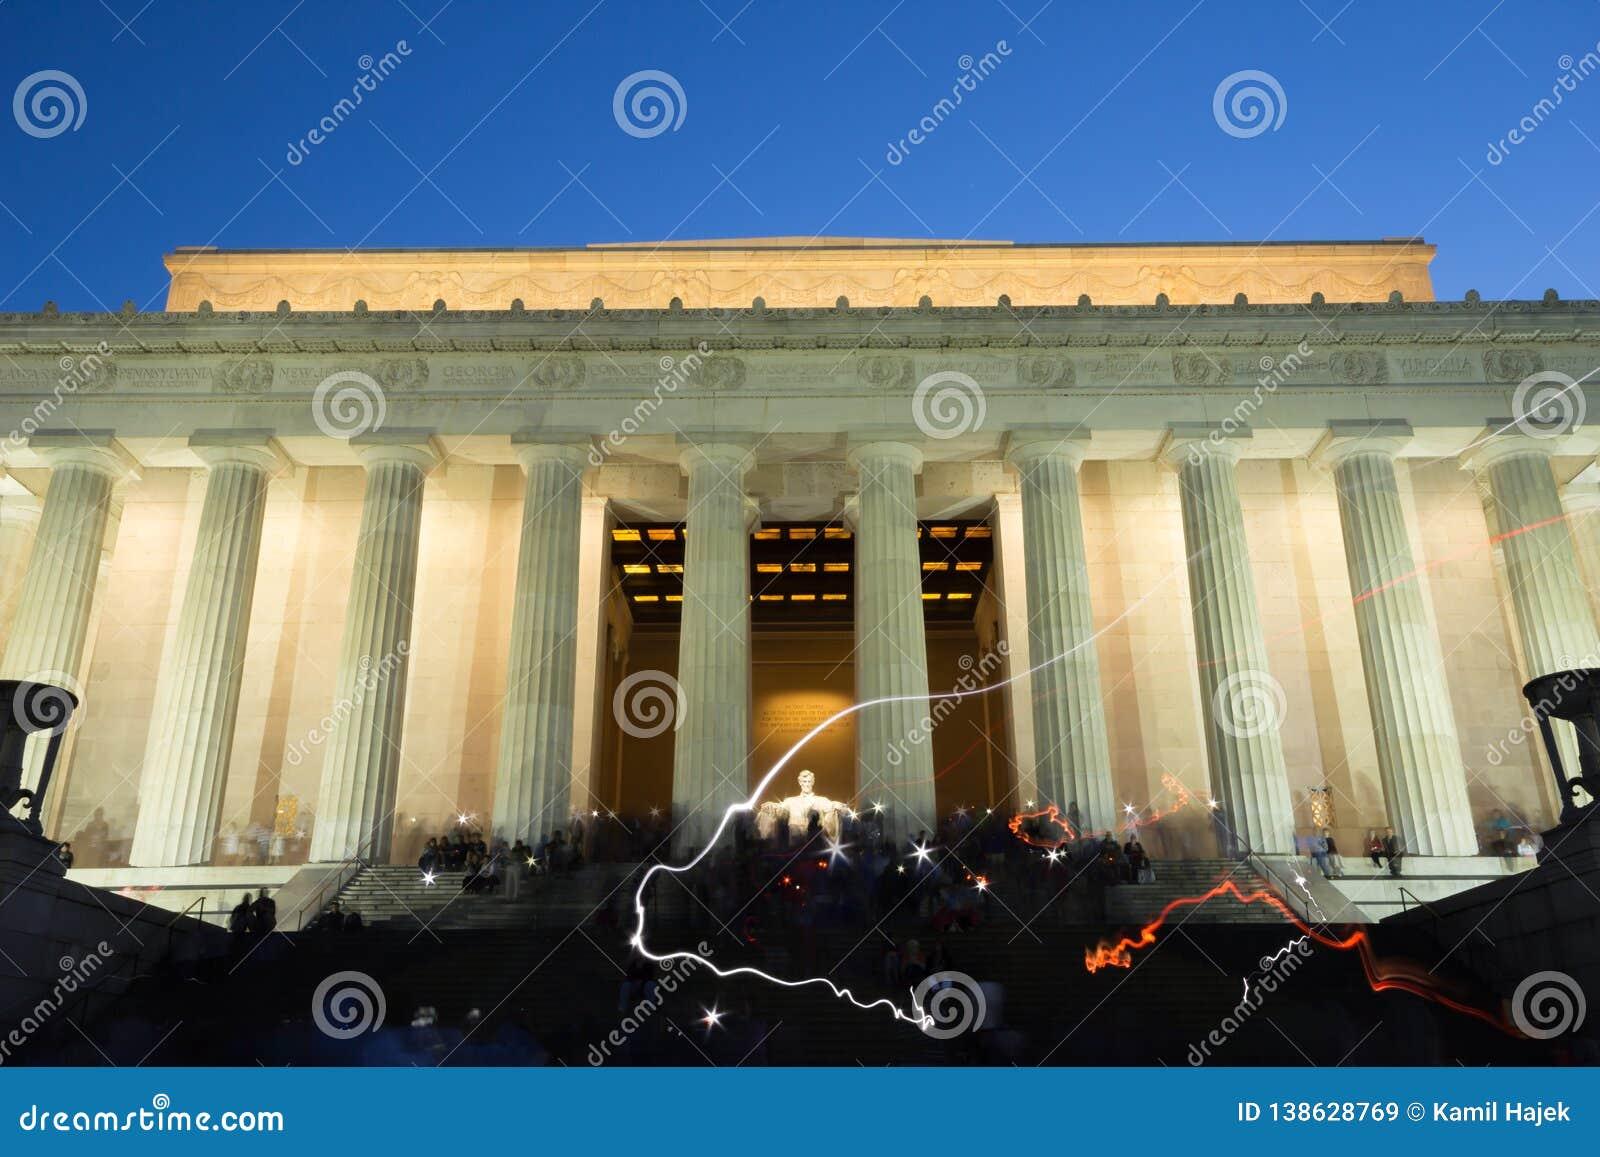 Lincoln Memorial Night Light Painting